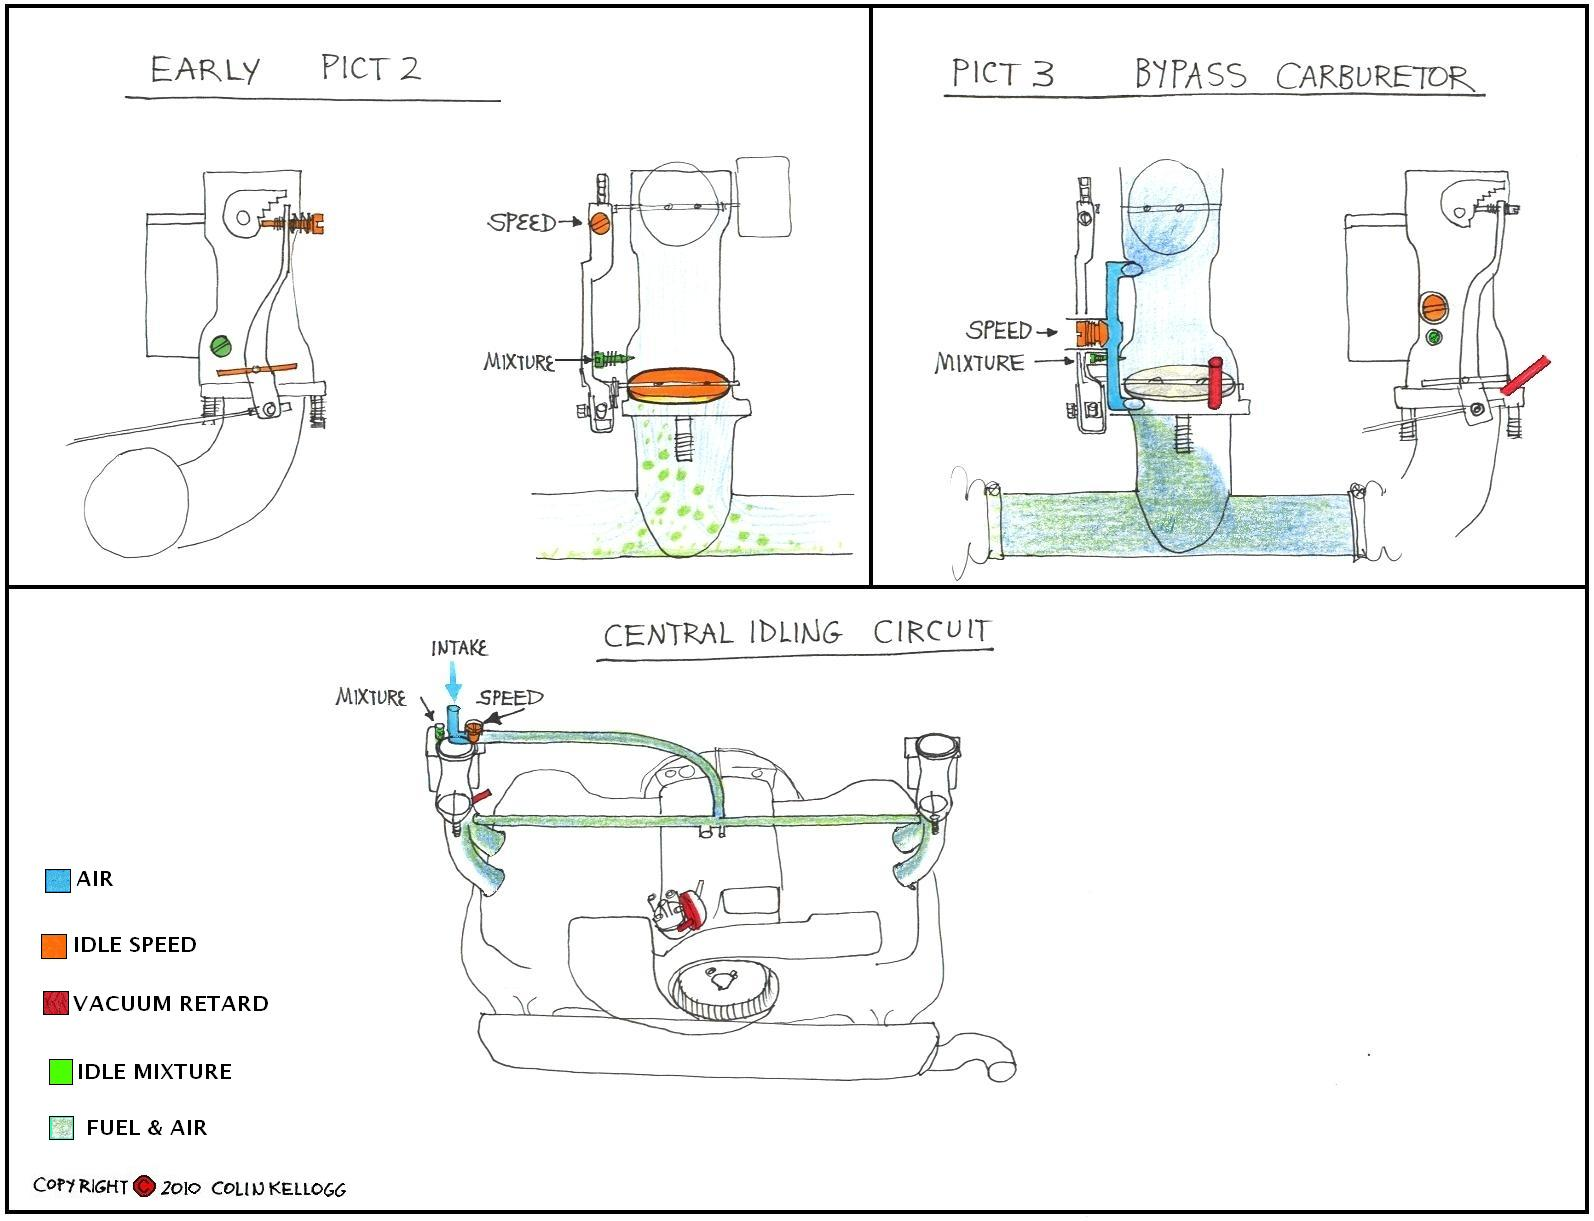 Fuel Line Inlet 34 Pict 3